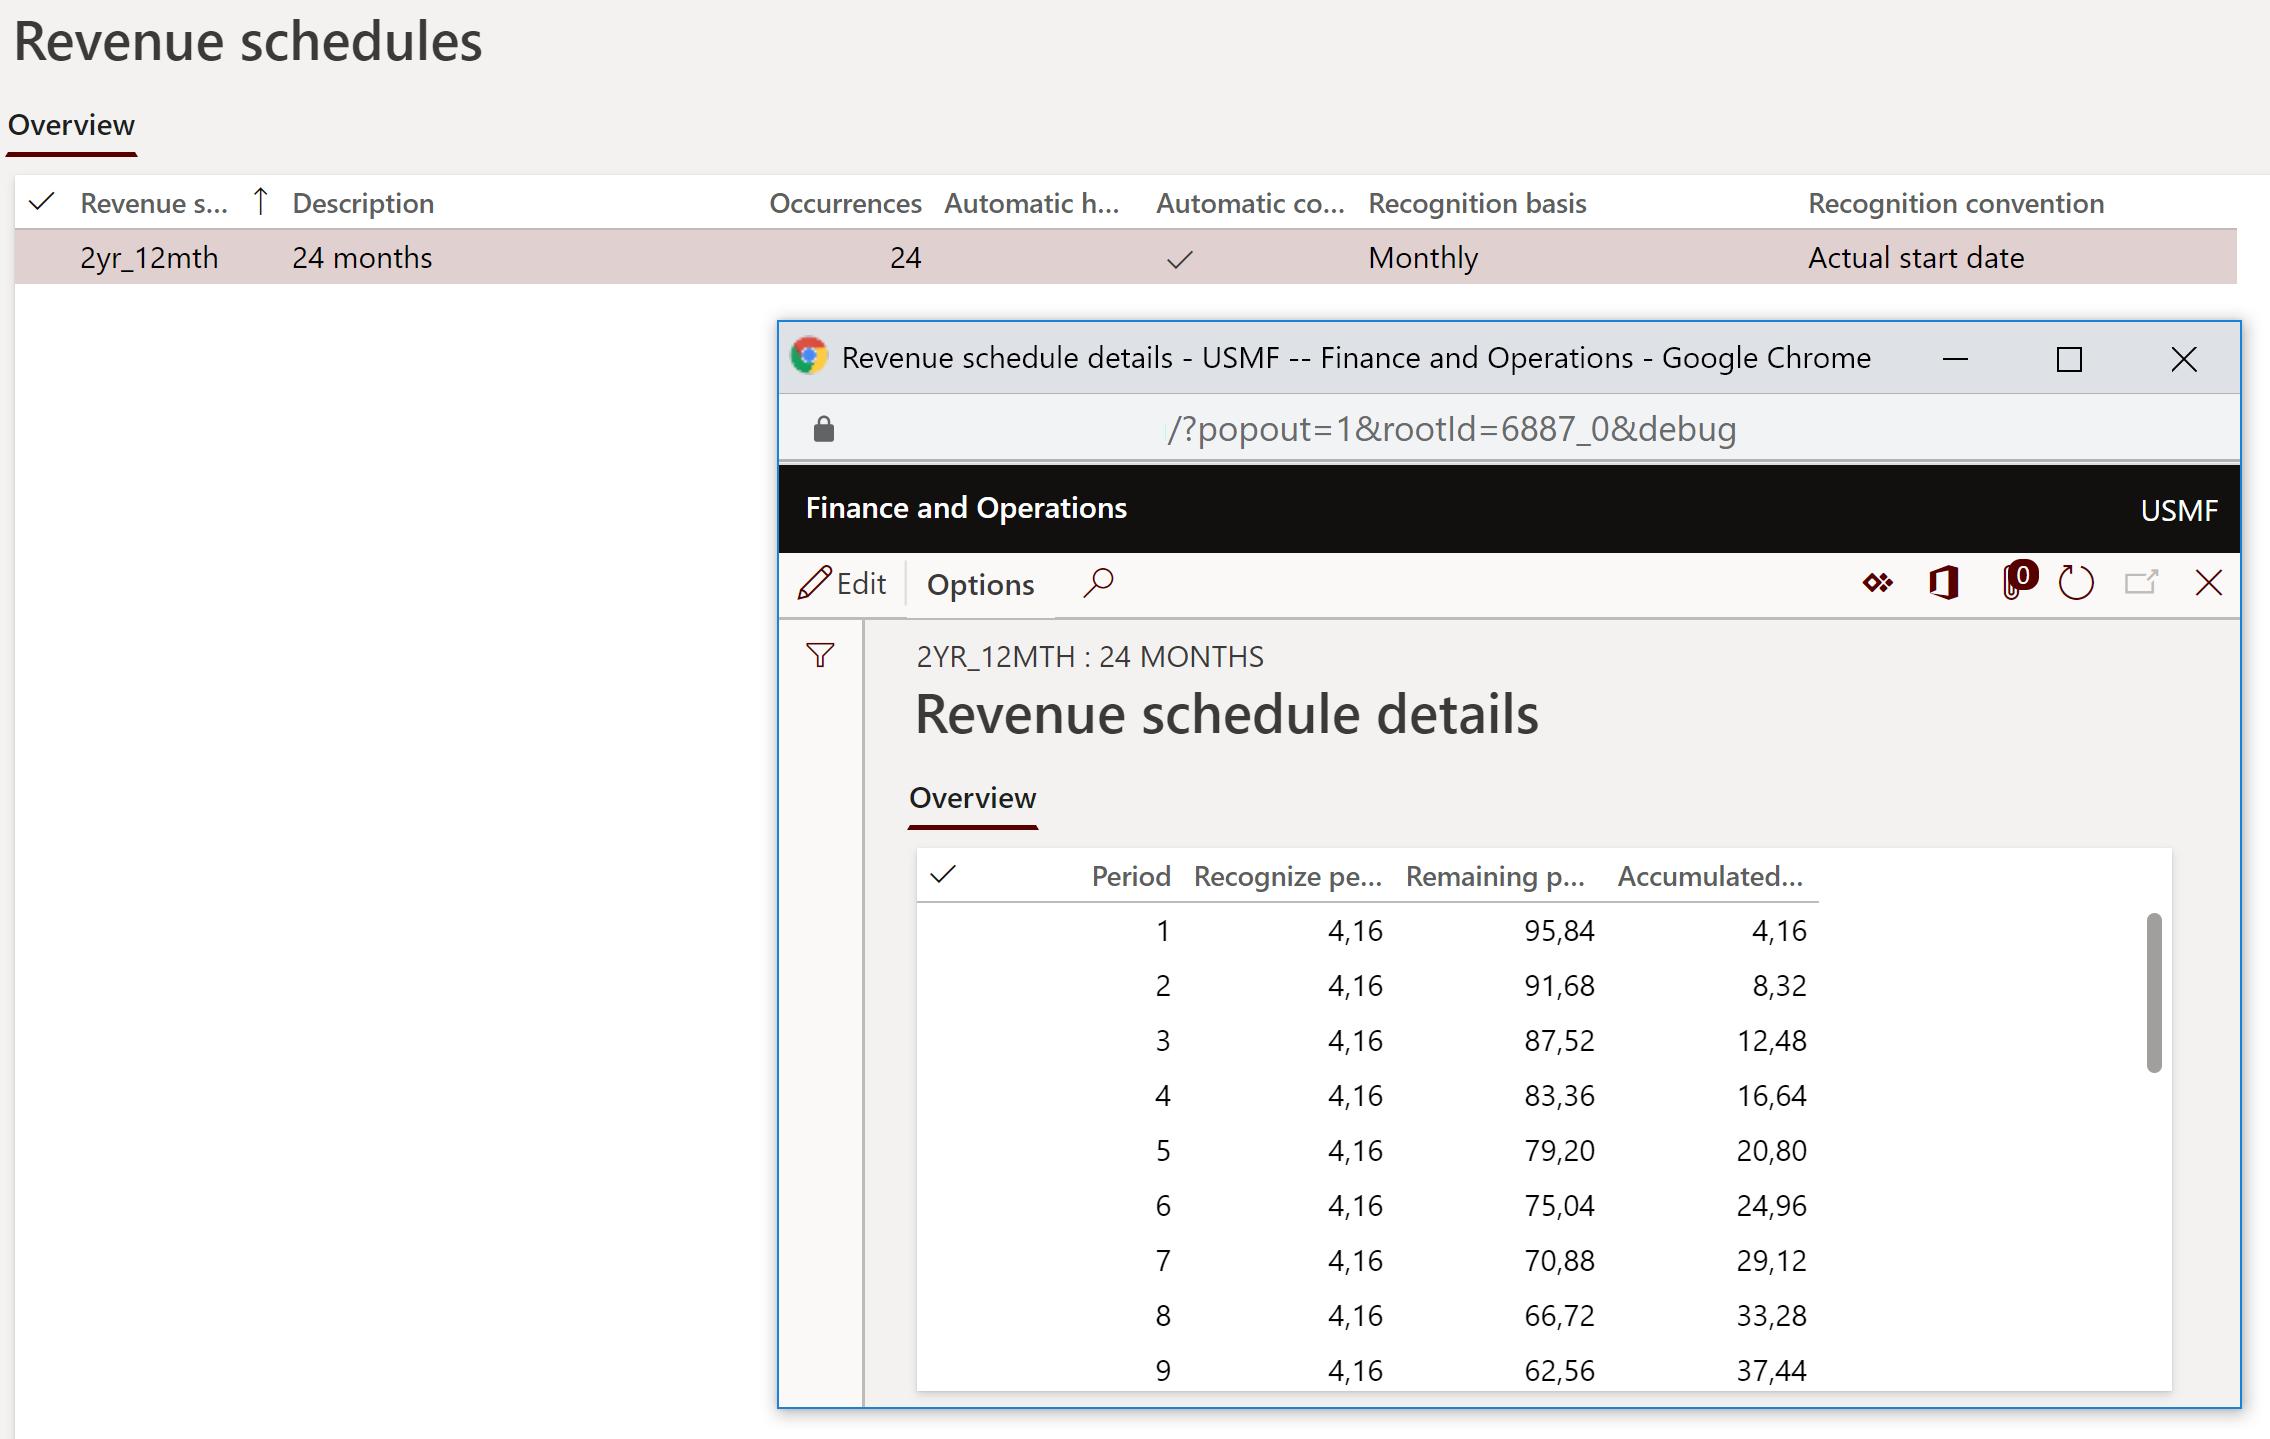 Revenue schedule